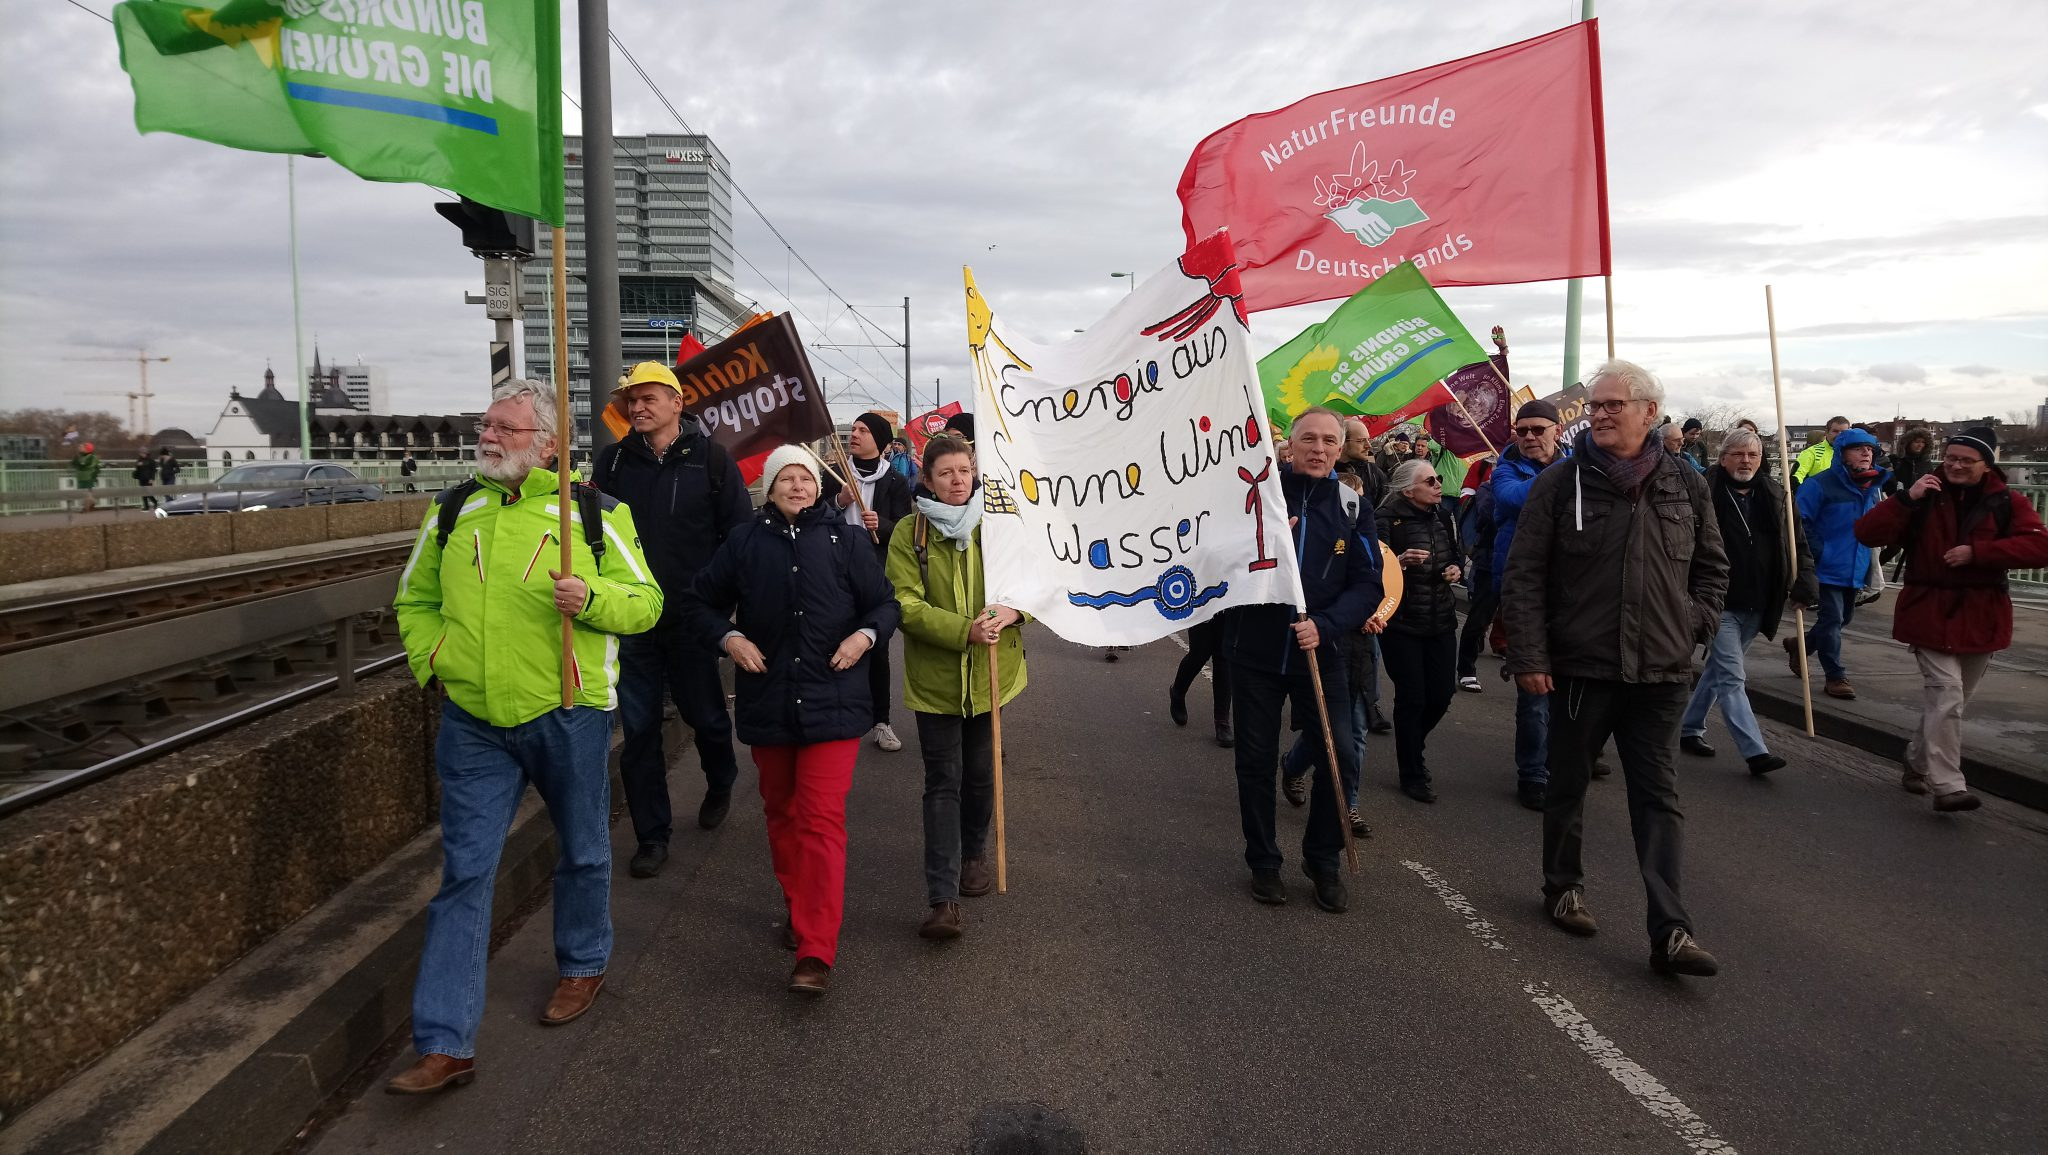 Grüne demonstrieren in Köln